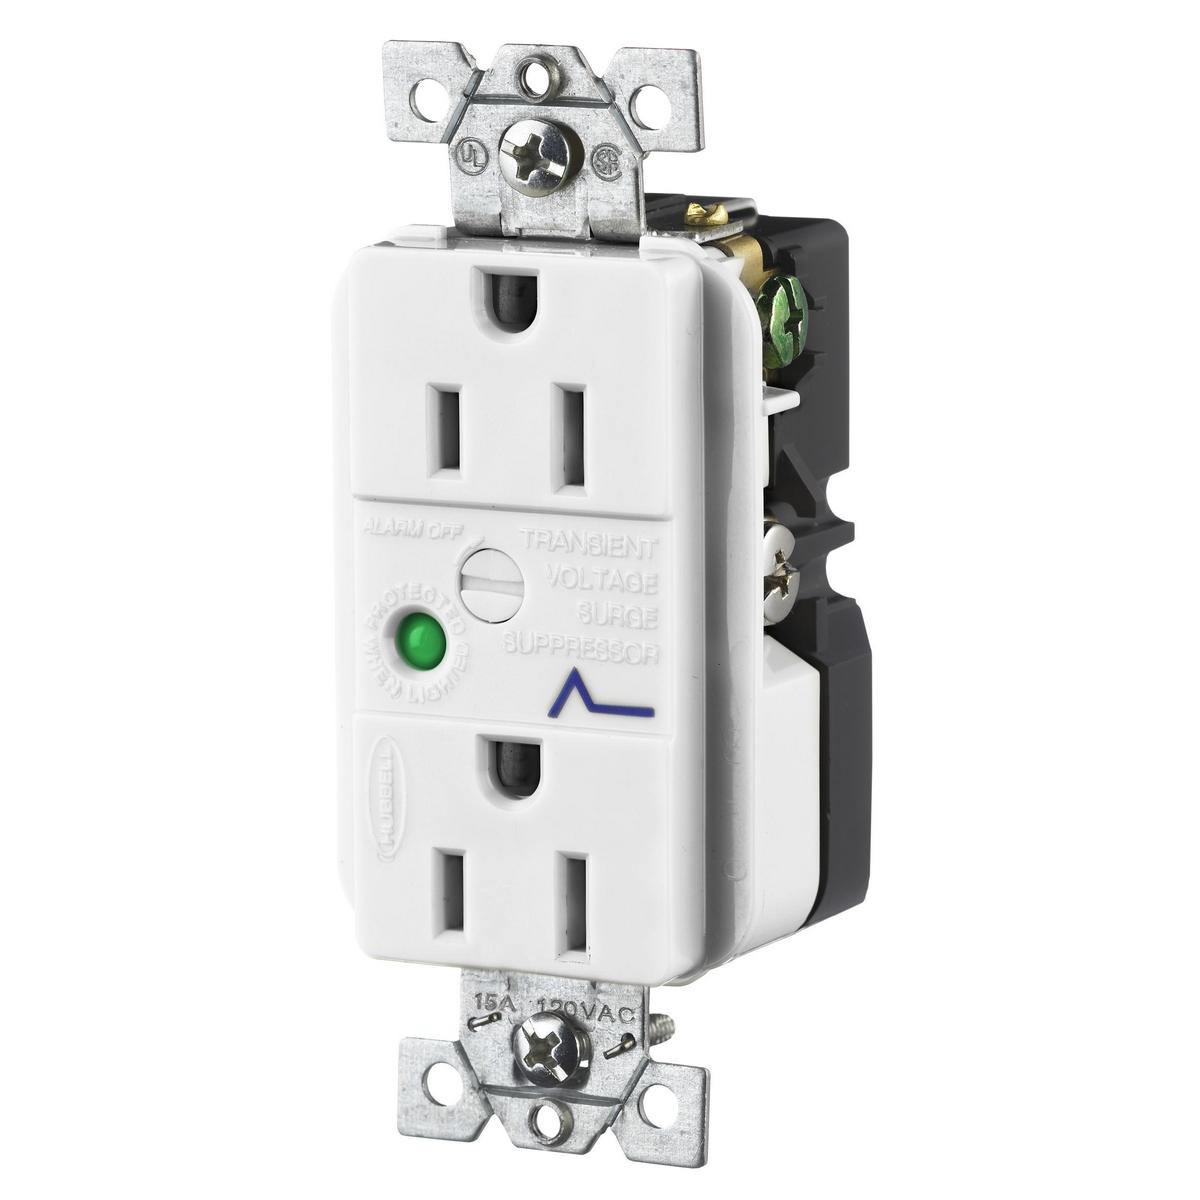 Hubbell HBL5262WSA 15 Amp 125 Volt 2-Pole 3-Wire NEMA 5-15R Office White Duplex Surge Suppression Receptacle